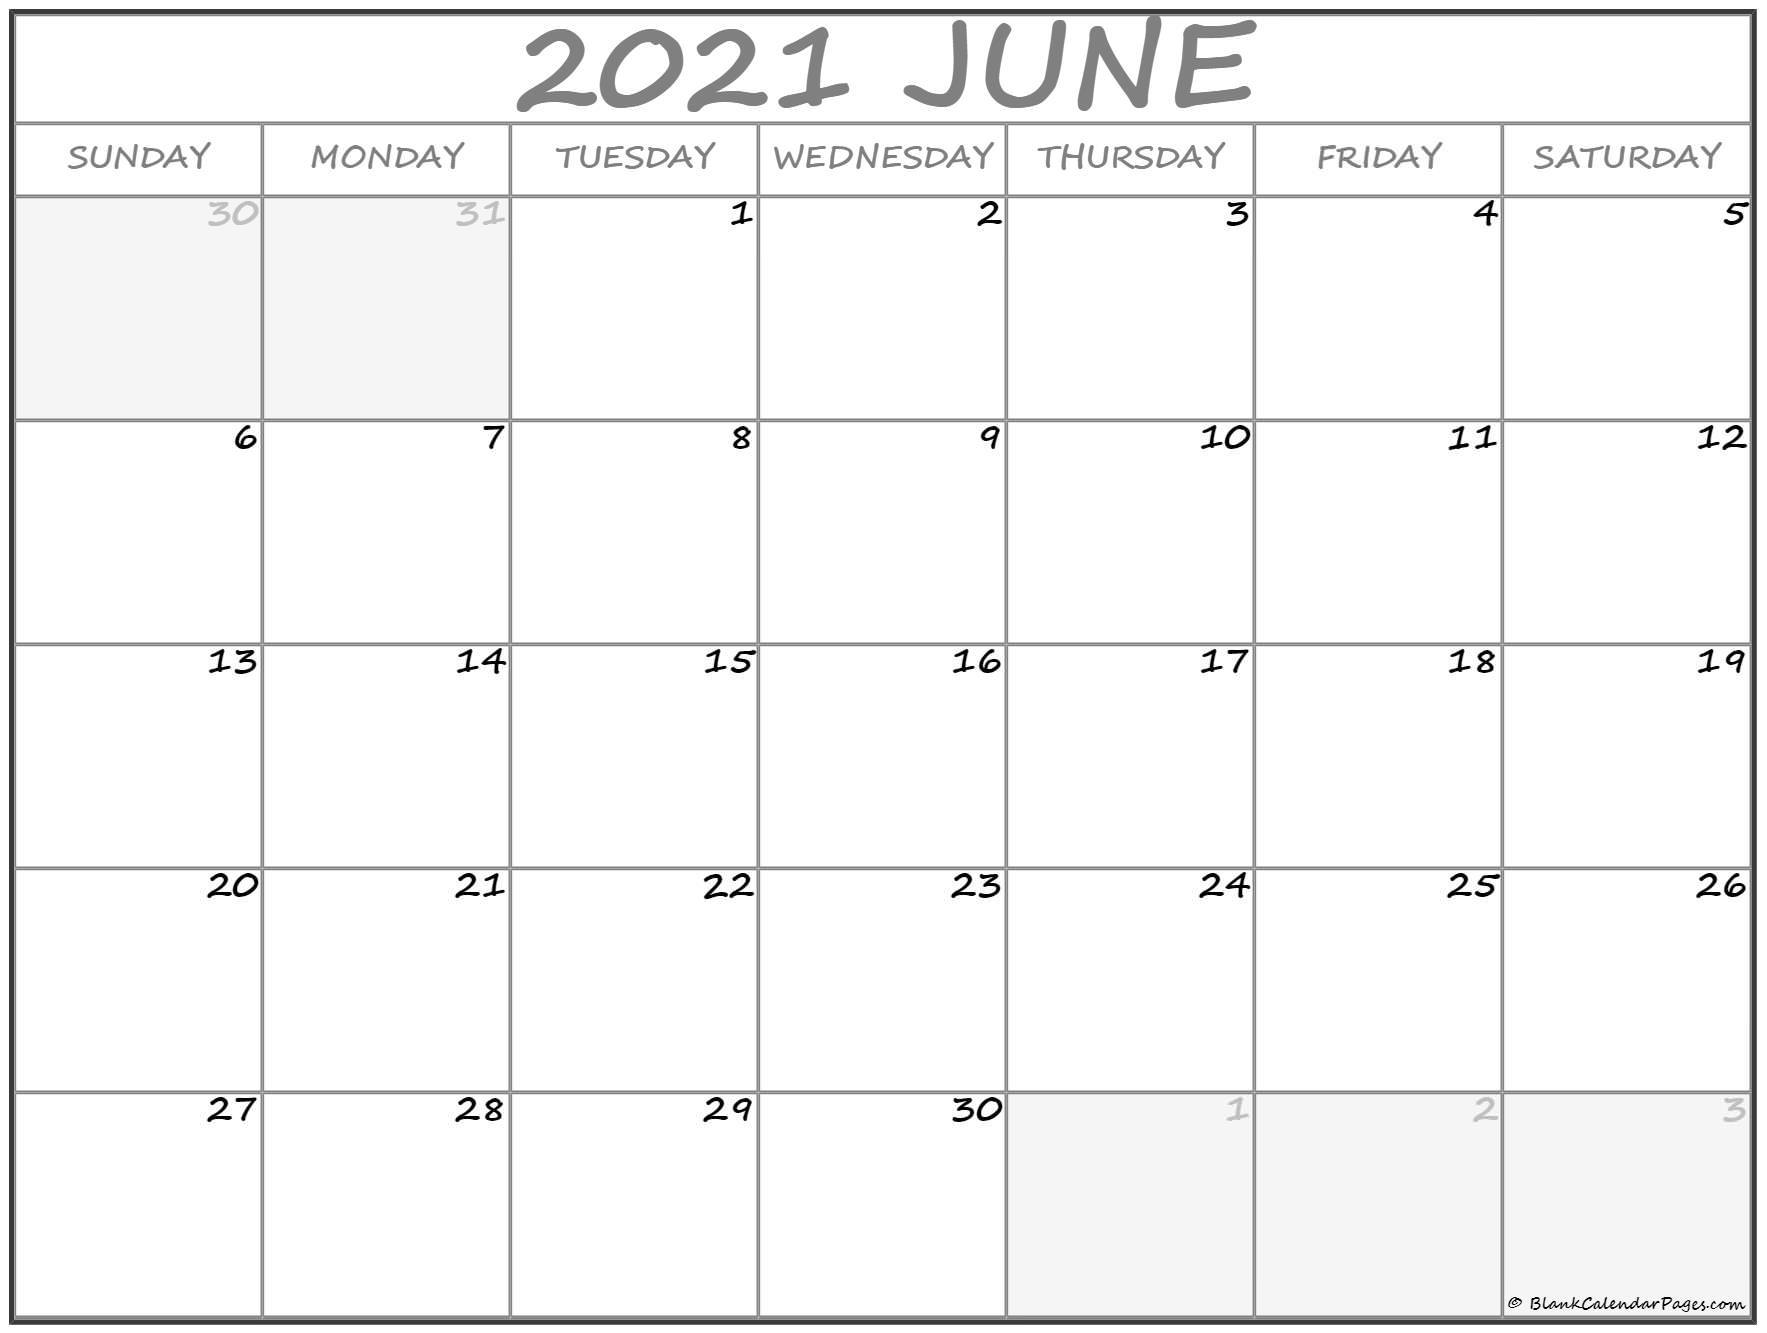 June 2021 Calendar | Free Printable Calendar Blank Calendar July 2020 To June 2021